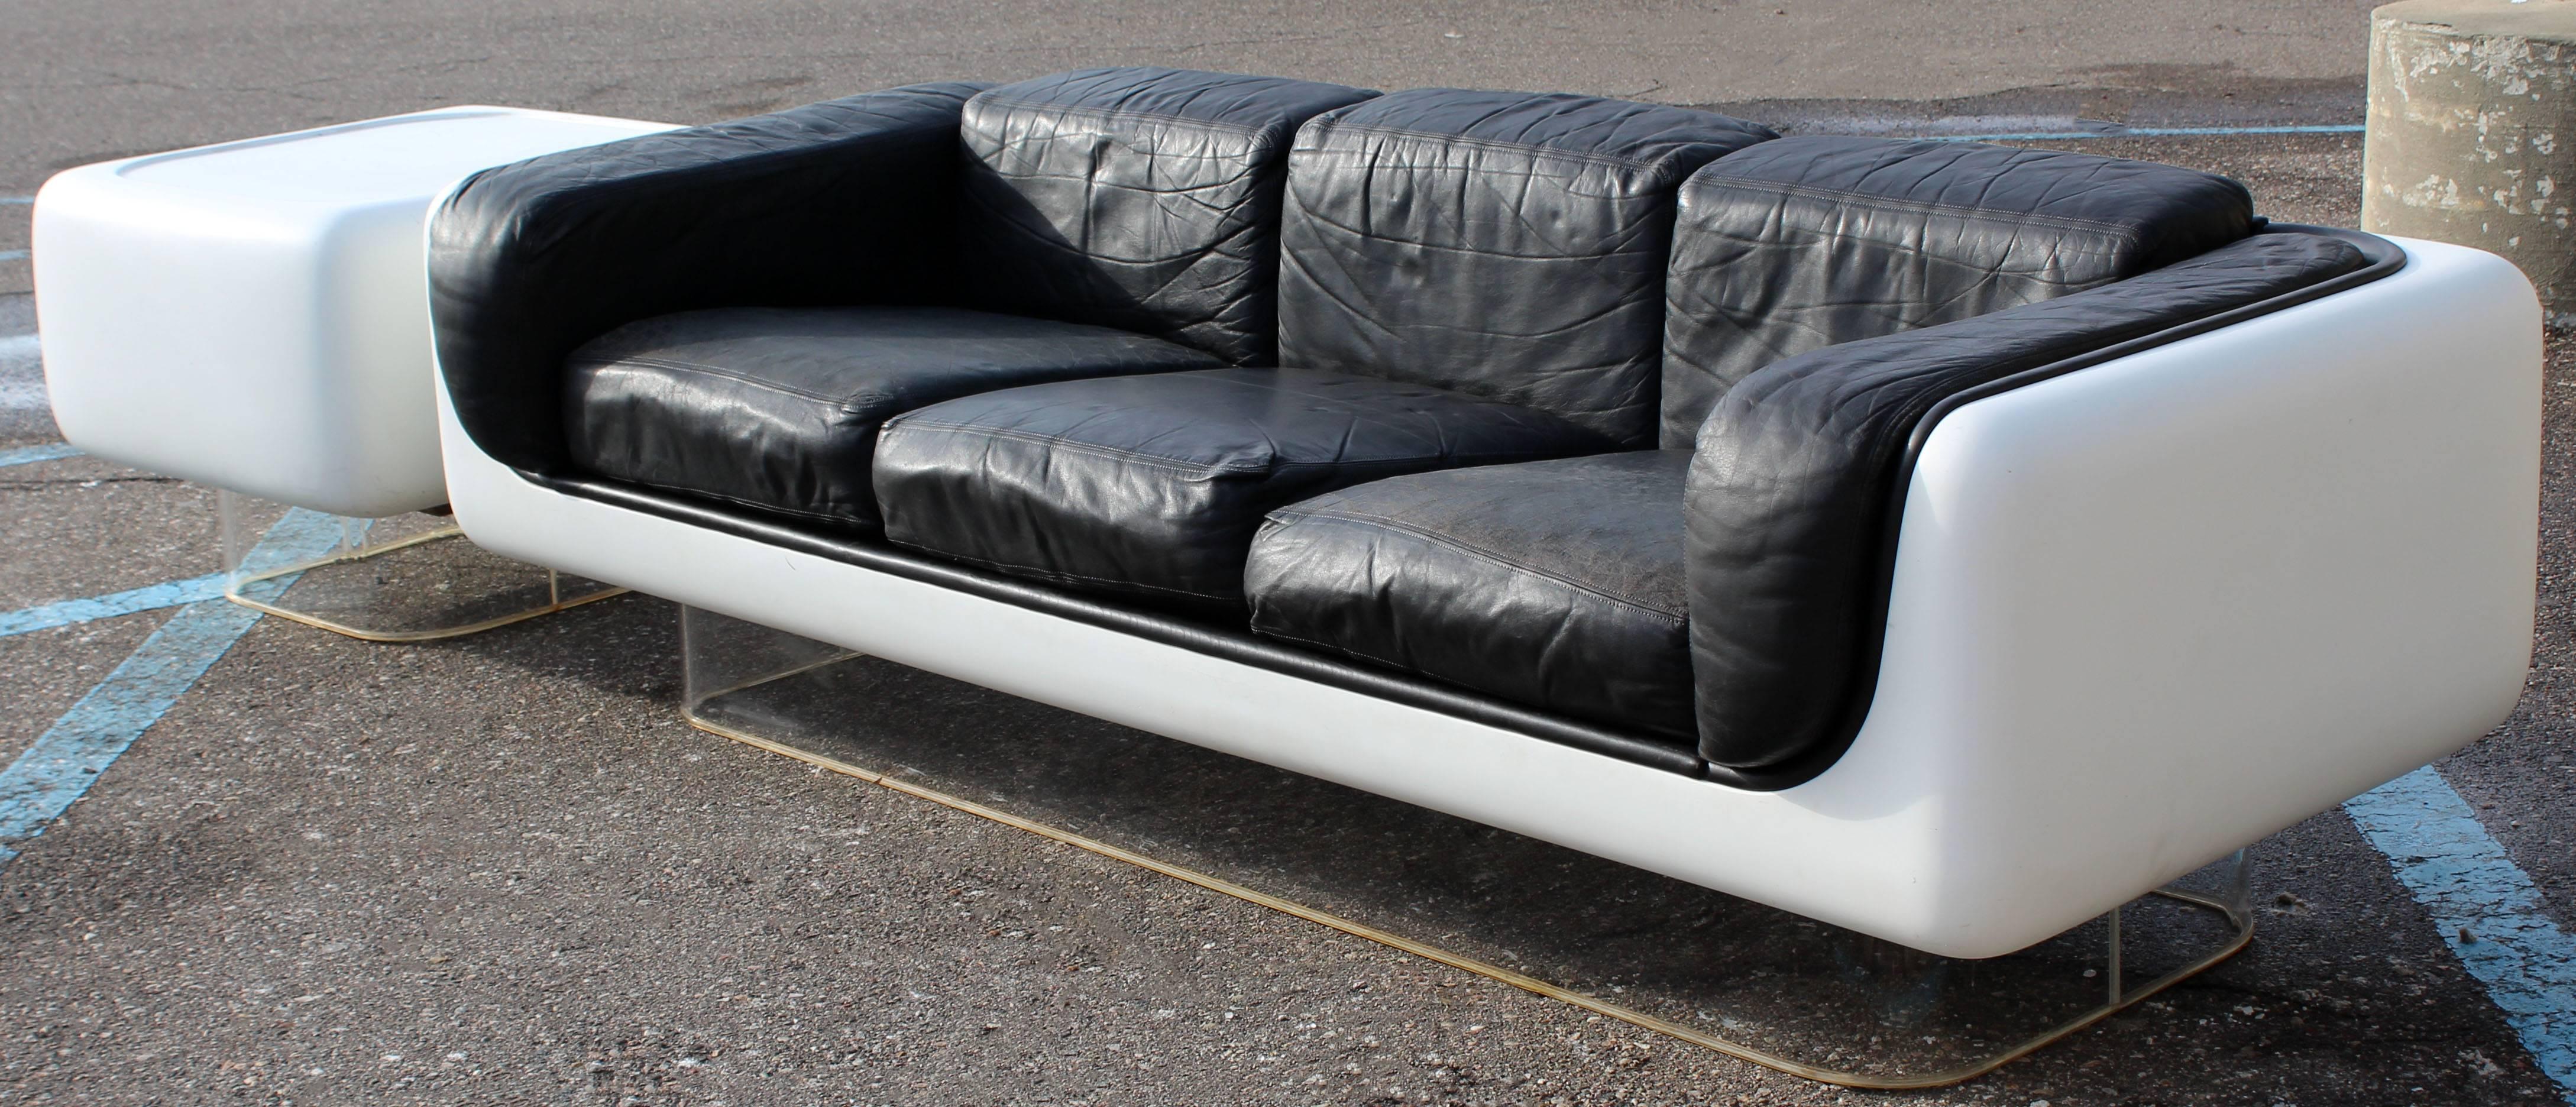 steelcase sofa platner sofas in seattle mid century modern warren style fiberglass lucite table for sale 2